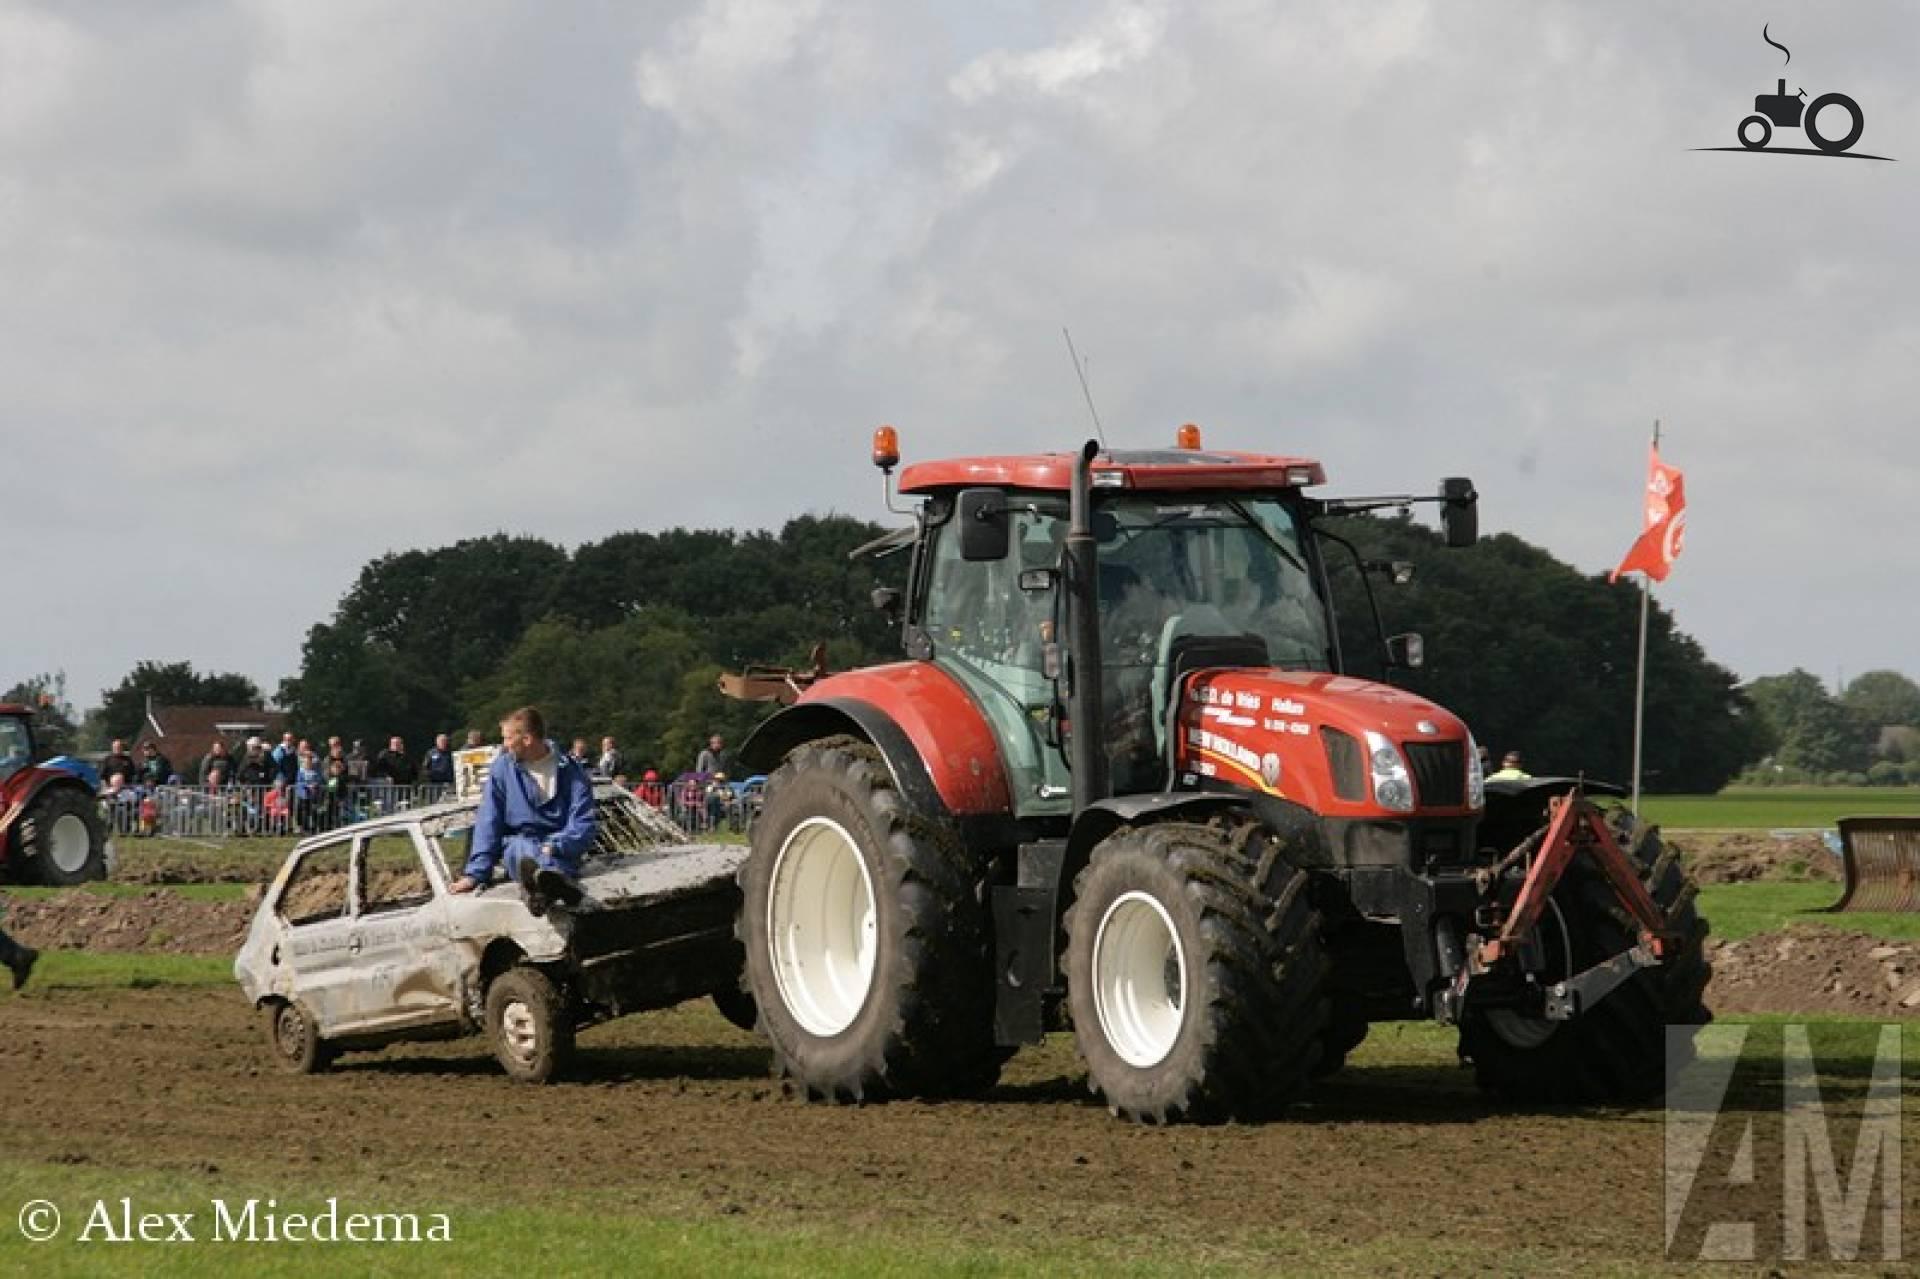 868222-t-6080-new-holland.jpg